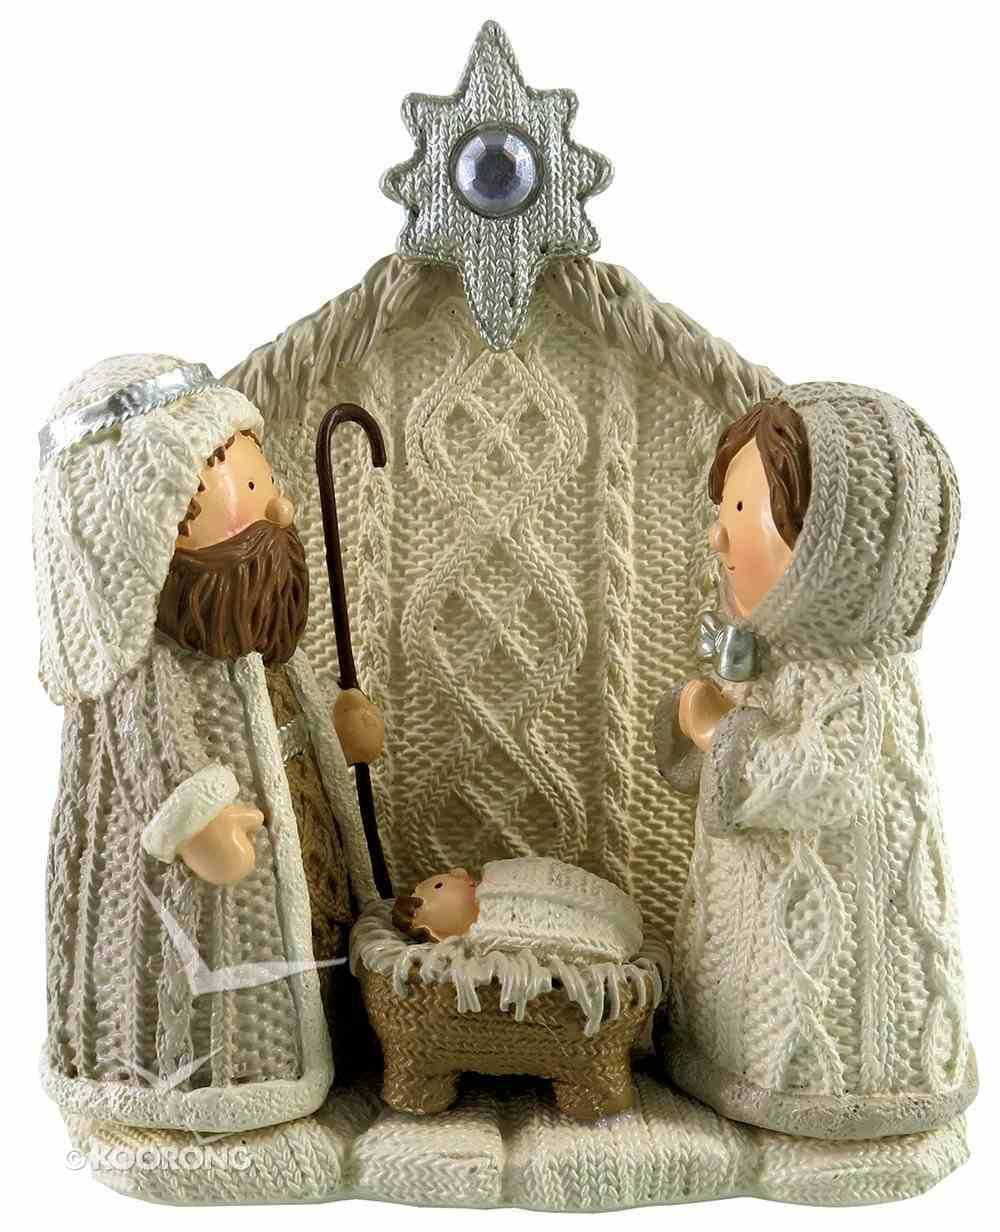 Resin Knitted Finish White/Beige Holy Family: Joseph, Mary & Baby Jesus Homeware